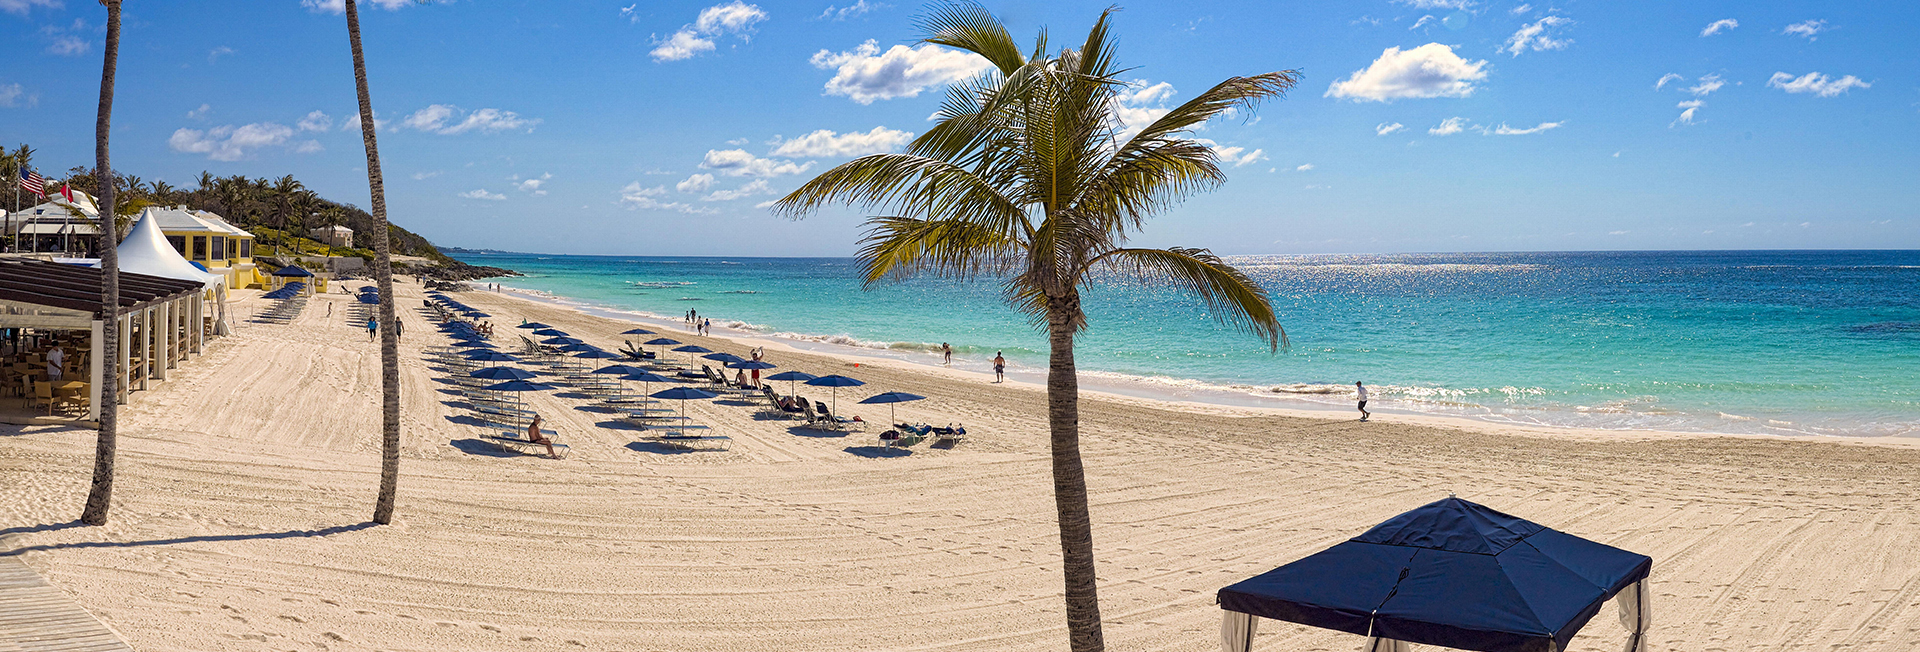 bermuda-destination.jpg